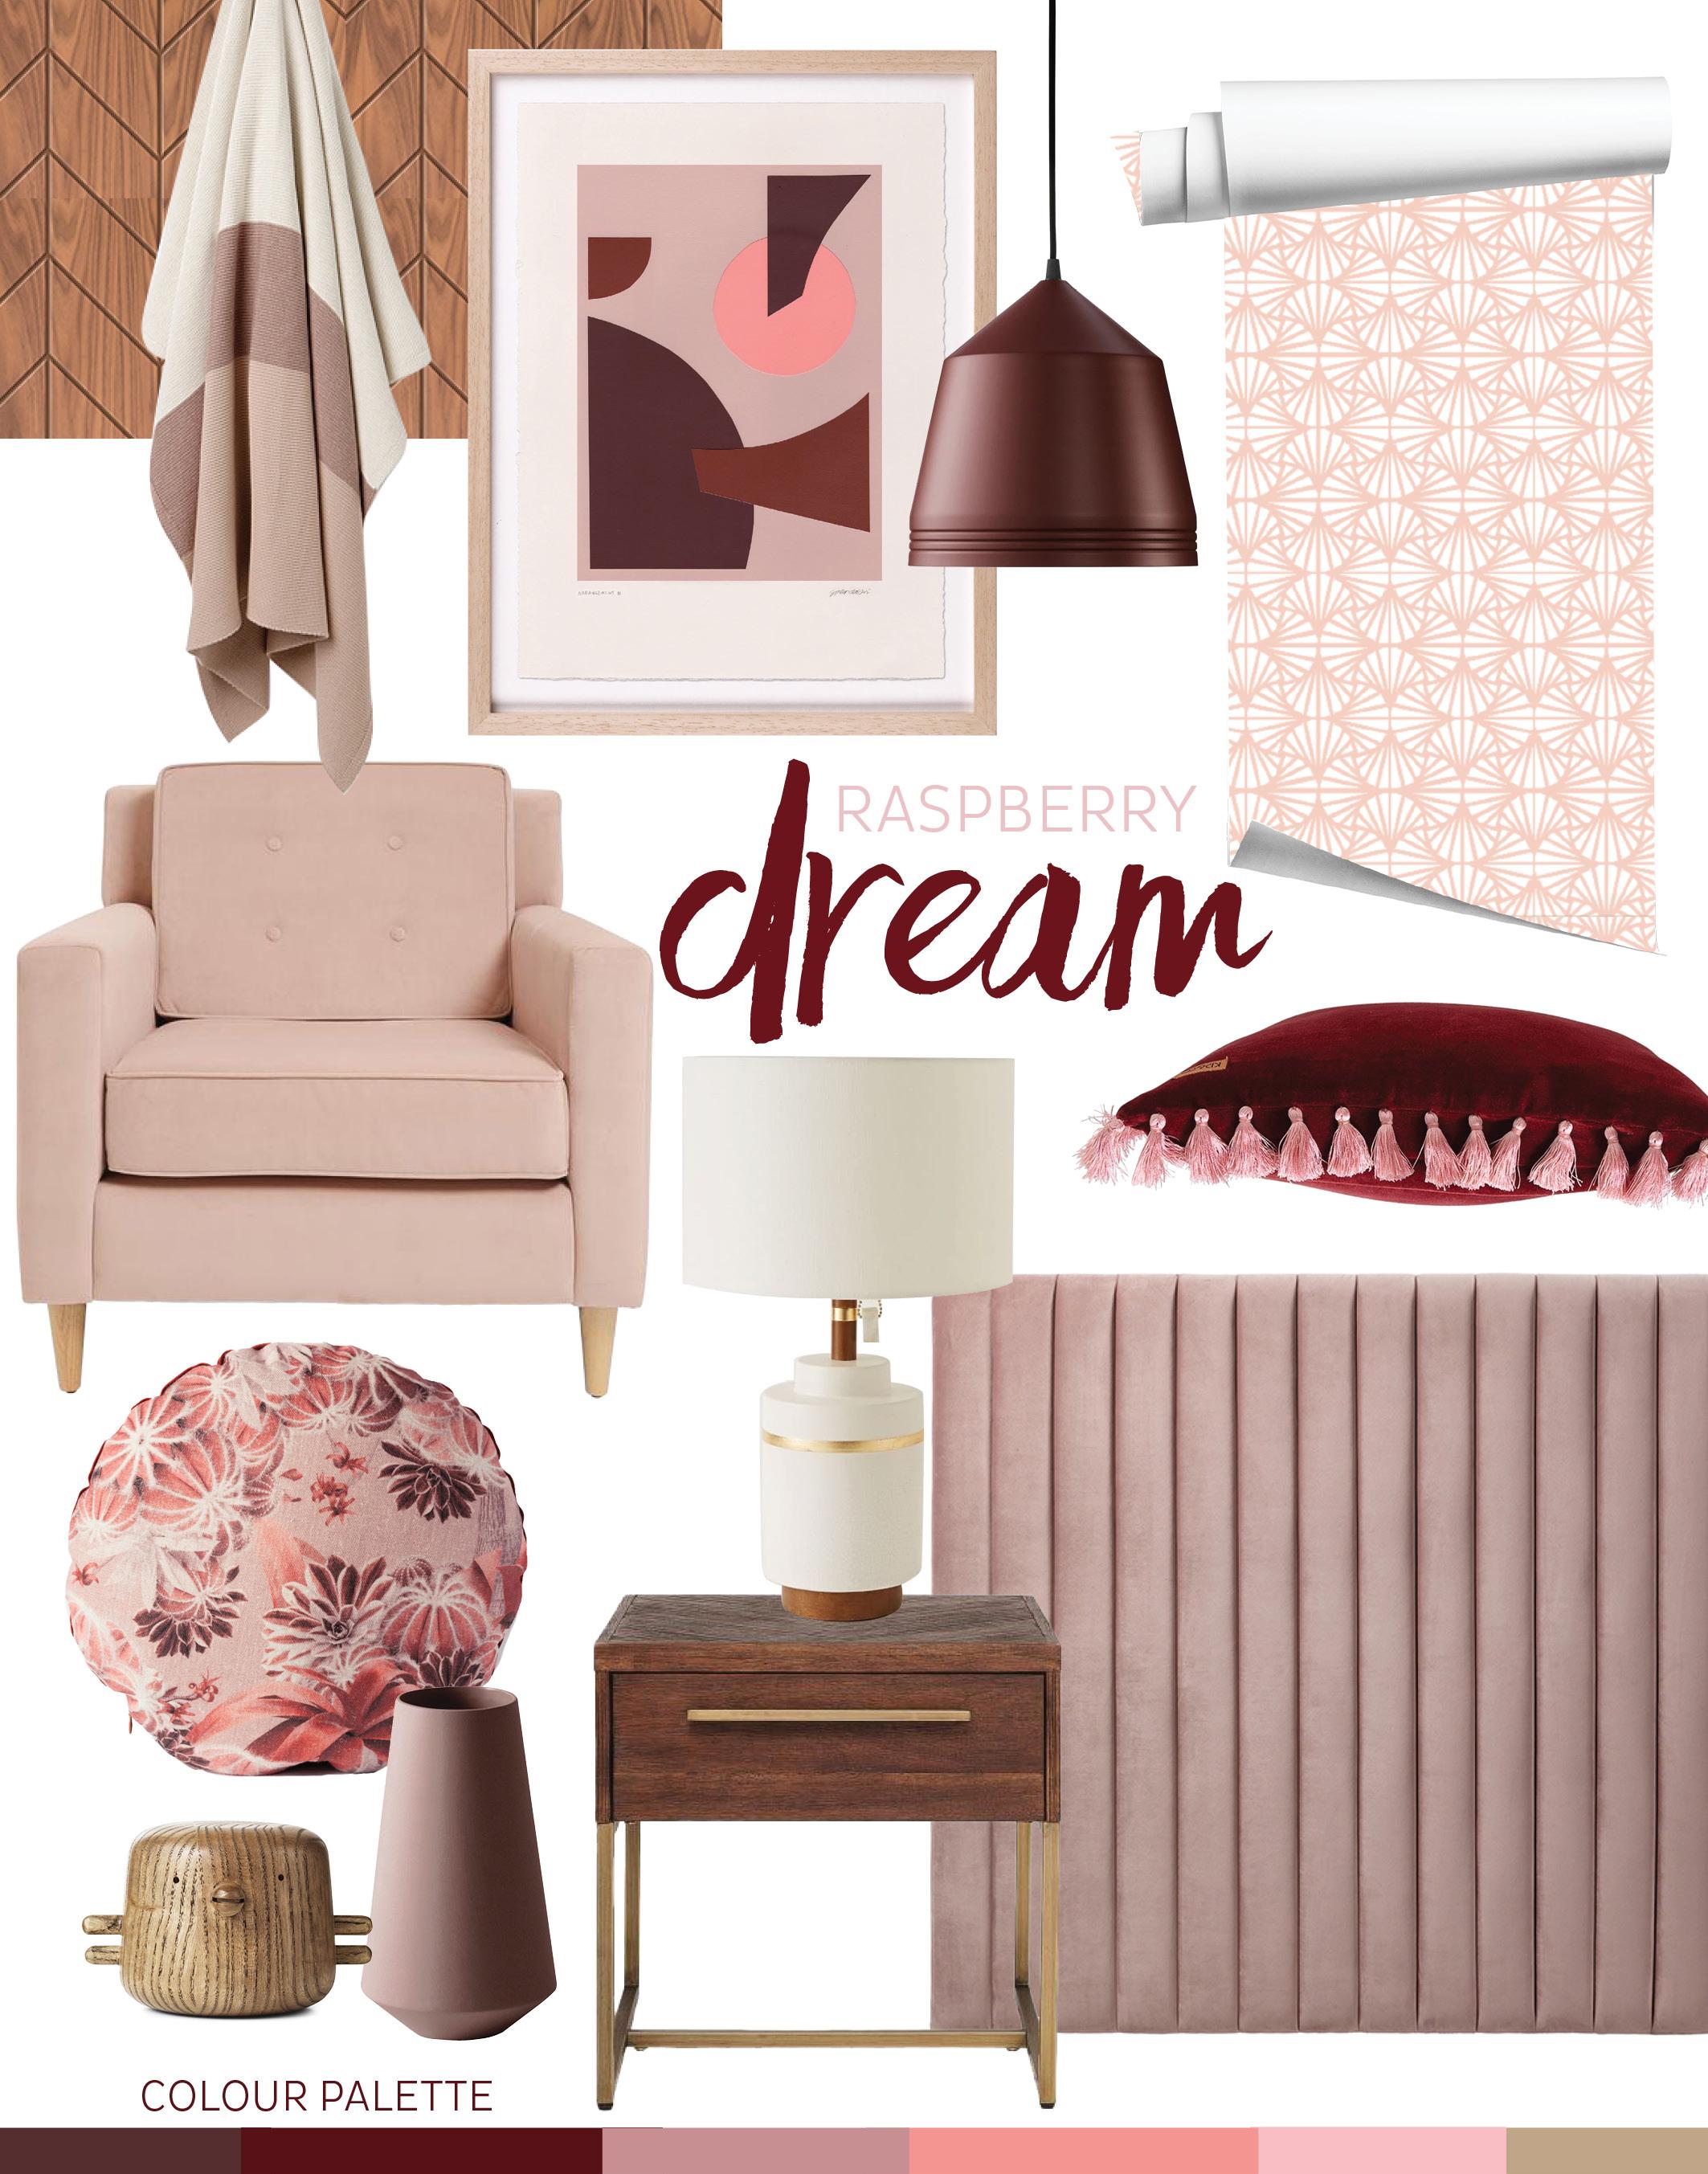 adore_home_blog_burgundy_raspberry_dream_pink_blush_mauve_bedroom_walnut_mid_century_modern_vibes_style.jpg